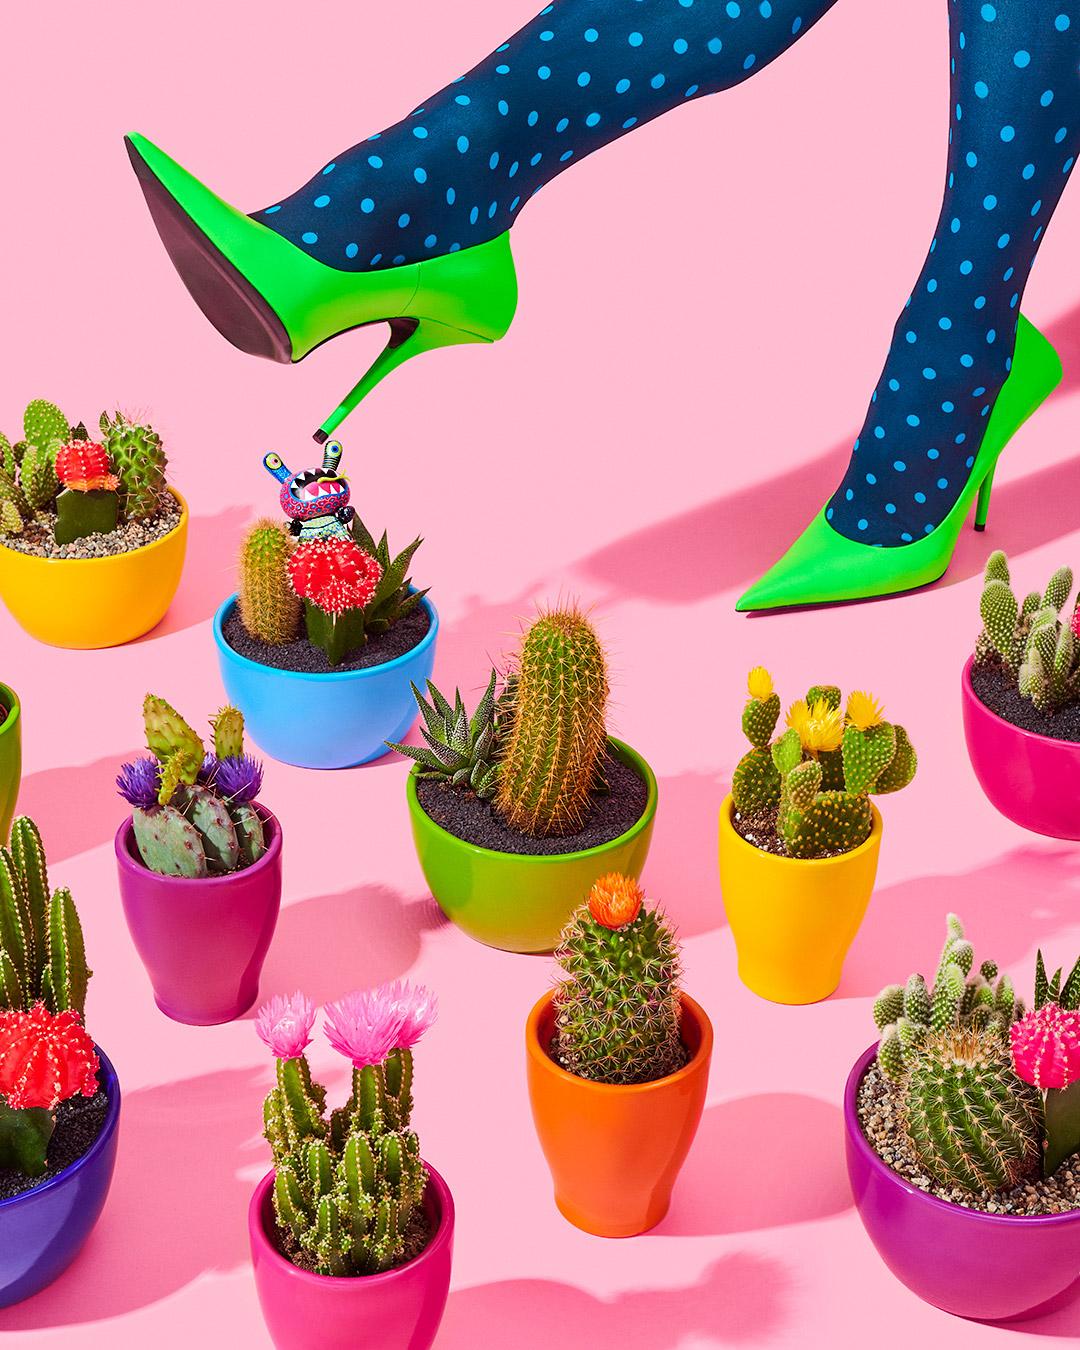 credits: photo - jenna gang, styling - chelsea volpe, nails - natsume chiharu, model - pauline sherrow  description: model wearing balenciaga heels stepping into a pile of rainbow cactus'.